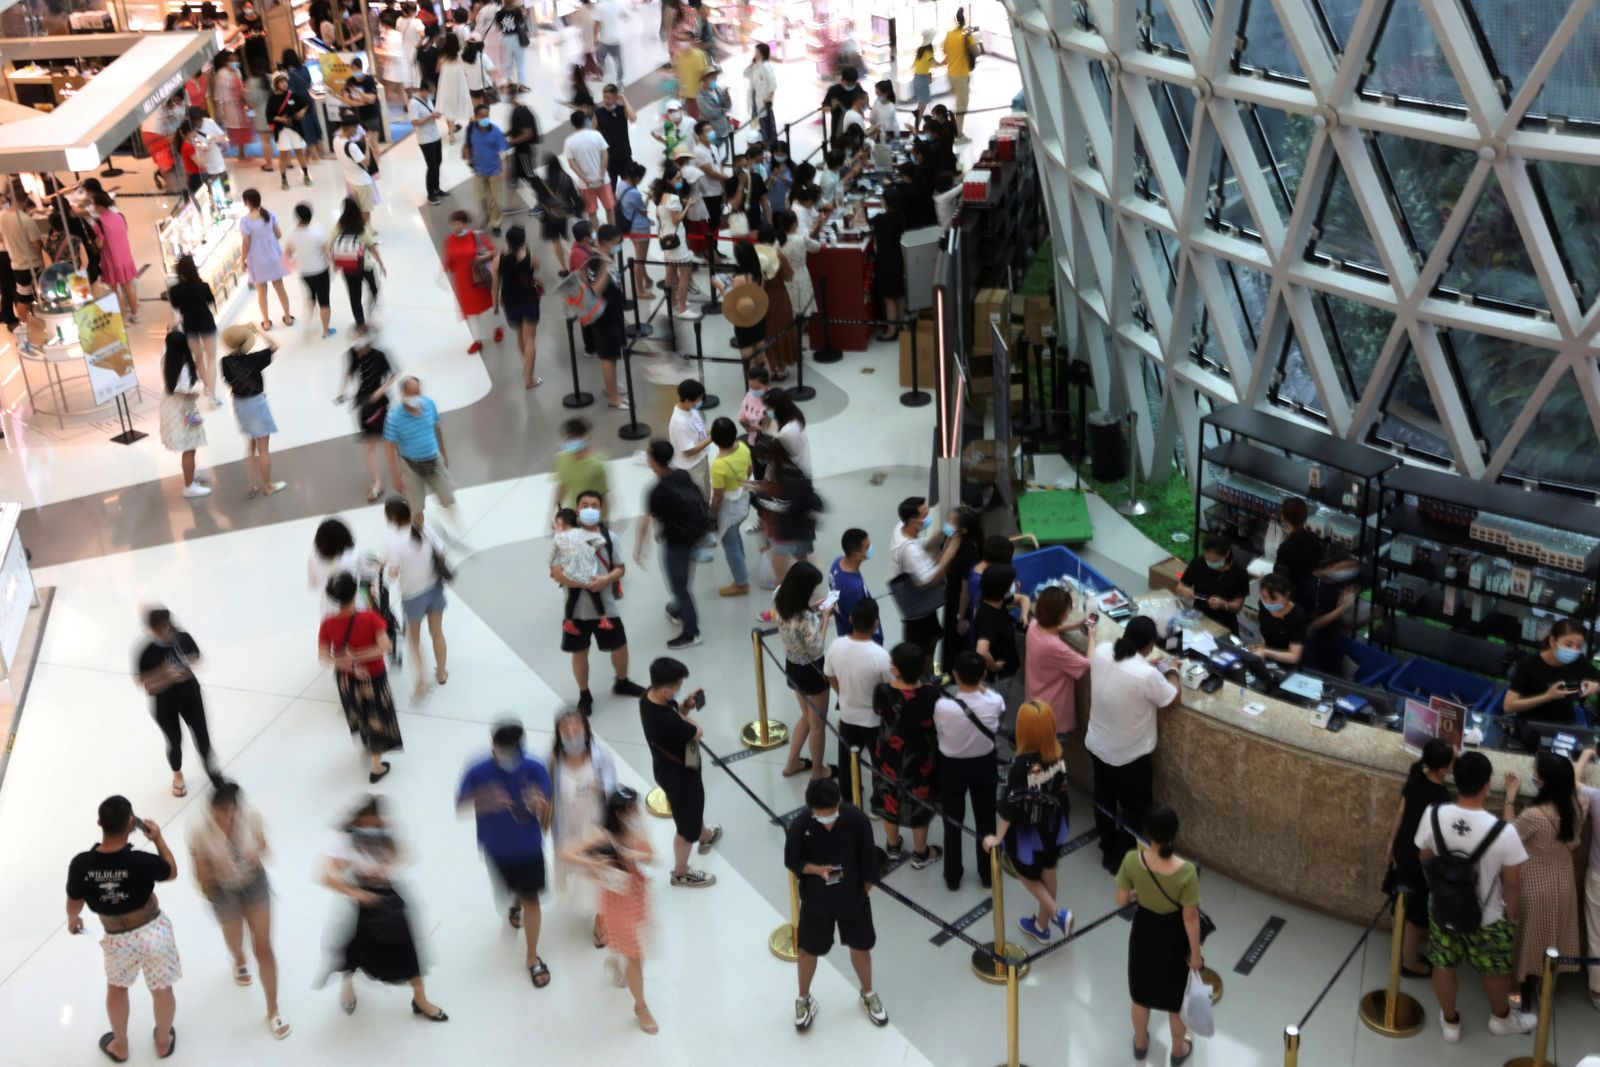 People shop at the Sanya International Duty-Free Shopping Complex in Sanya